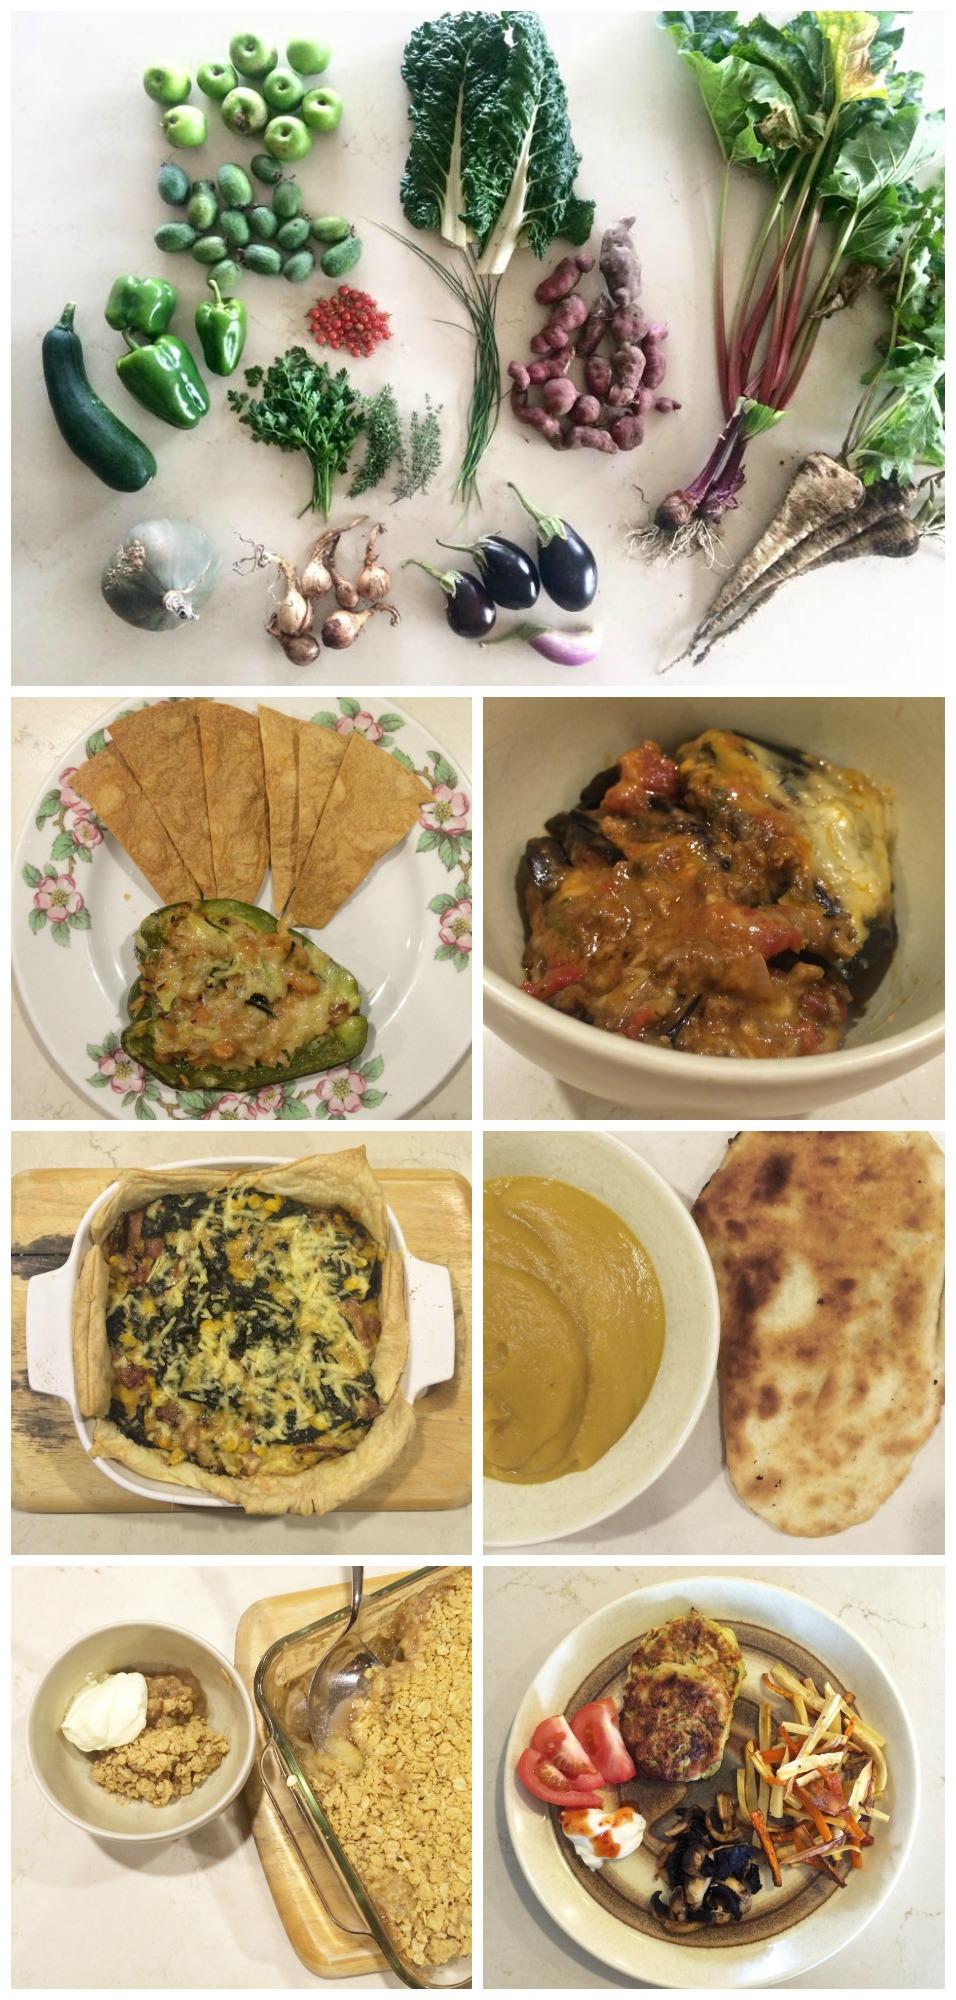 Organic Garden Meal Planning